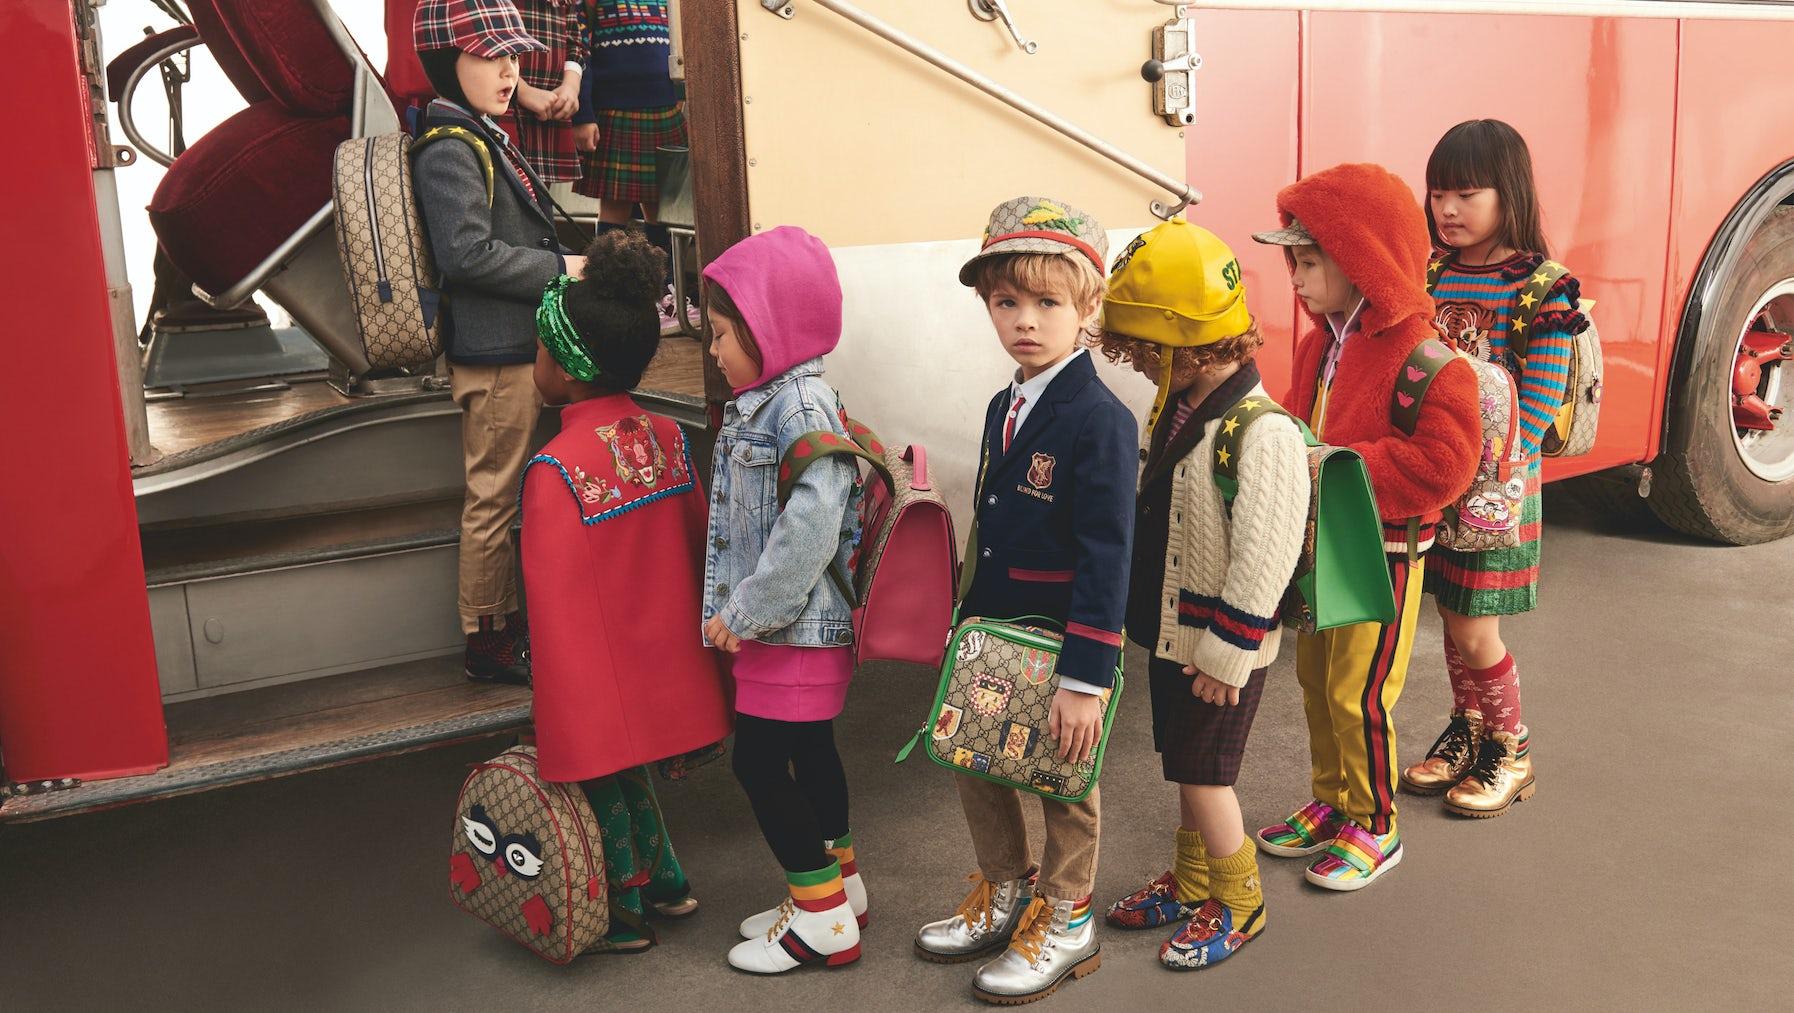 How Millennial Culture Is Driving the Luxury Kidswear Market